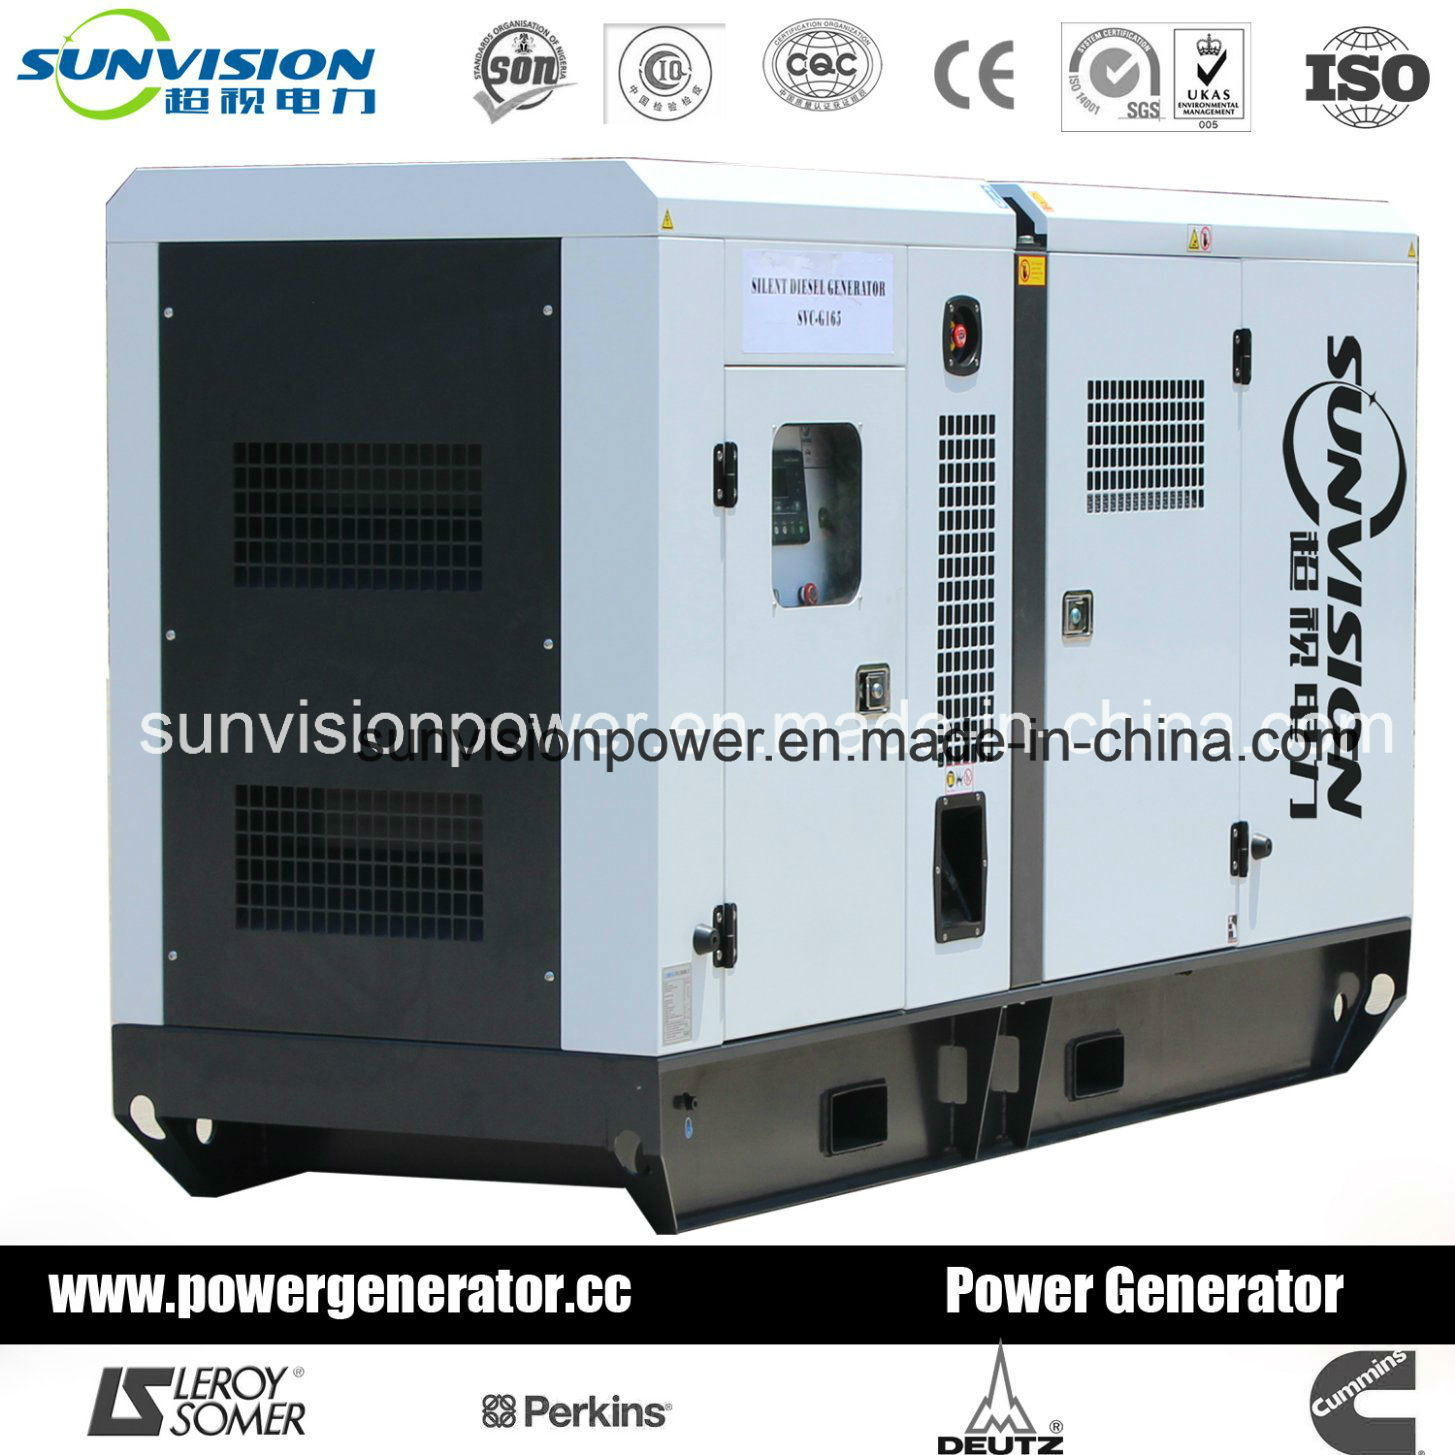 China 88kVA Reliable Power Generator with Perkins Engine (EU certificate) -  China Diesel Generator Set, Silent Type Generator